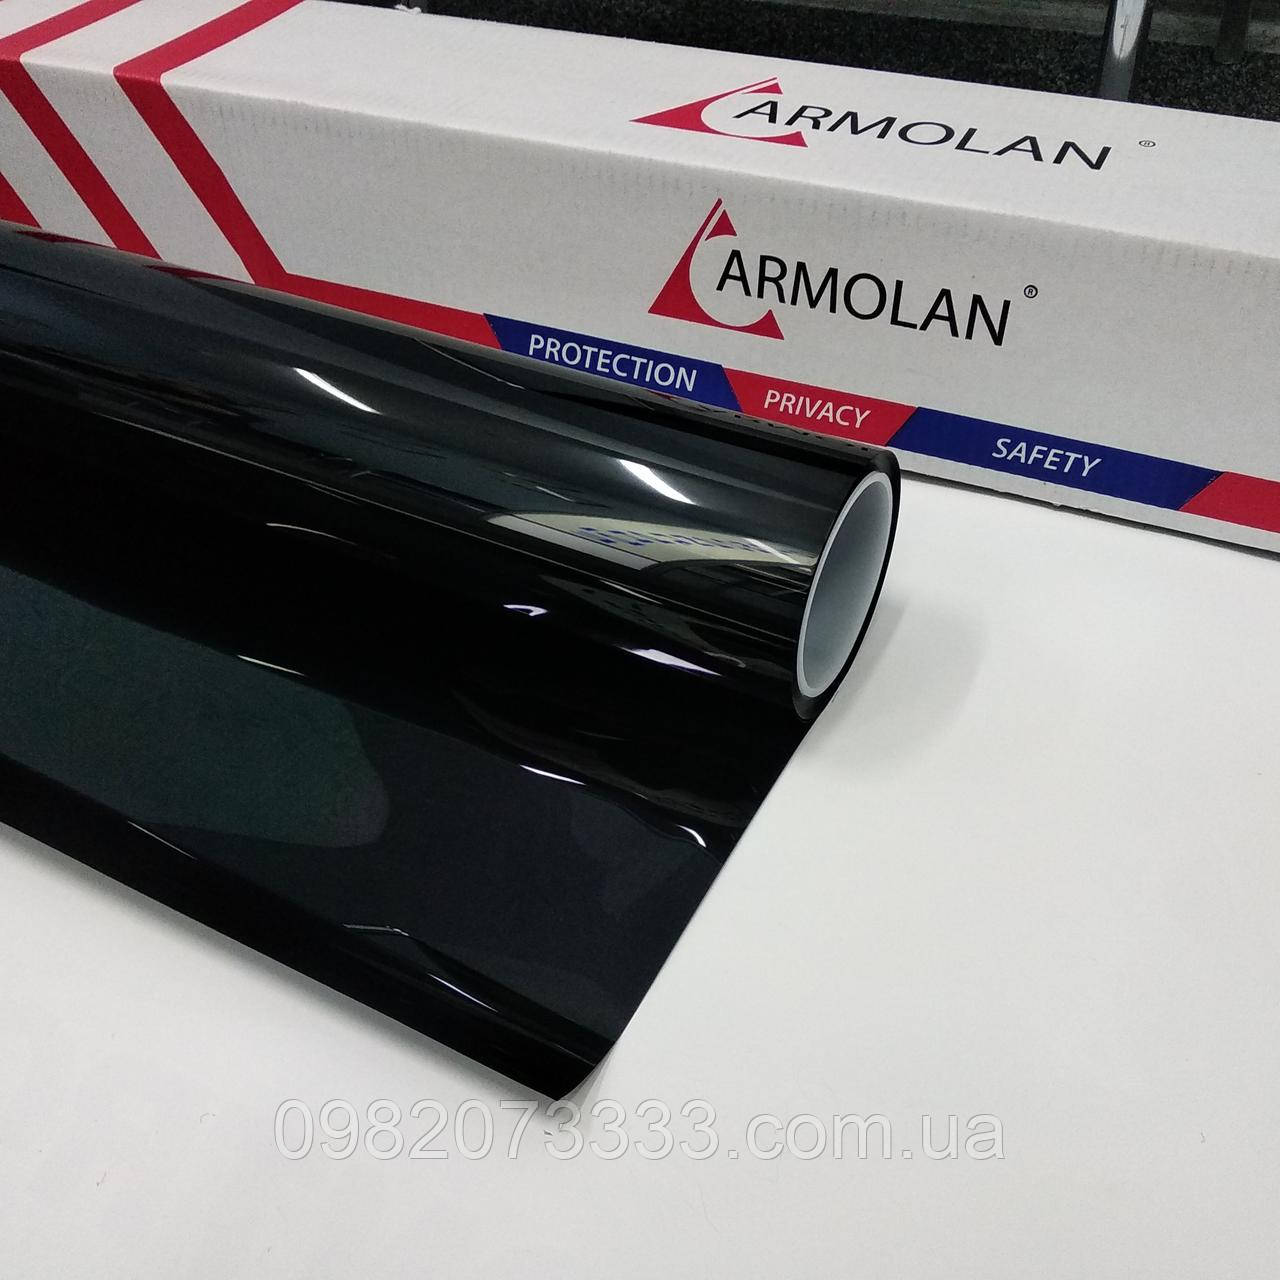 Armolan Elit Nickel 35 (ширина 1,524м) автомобильная тонировочная плёнка премиум класса.(1,524) (кв.м.)